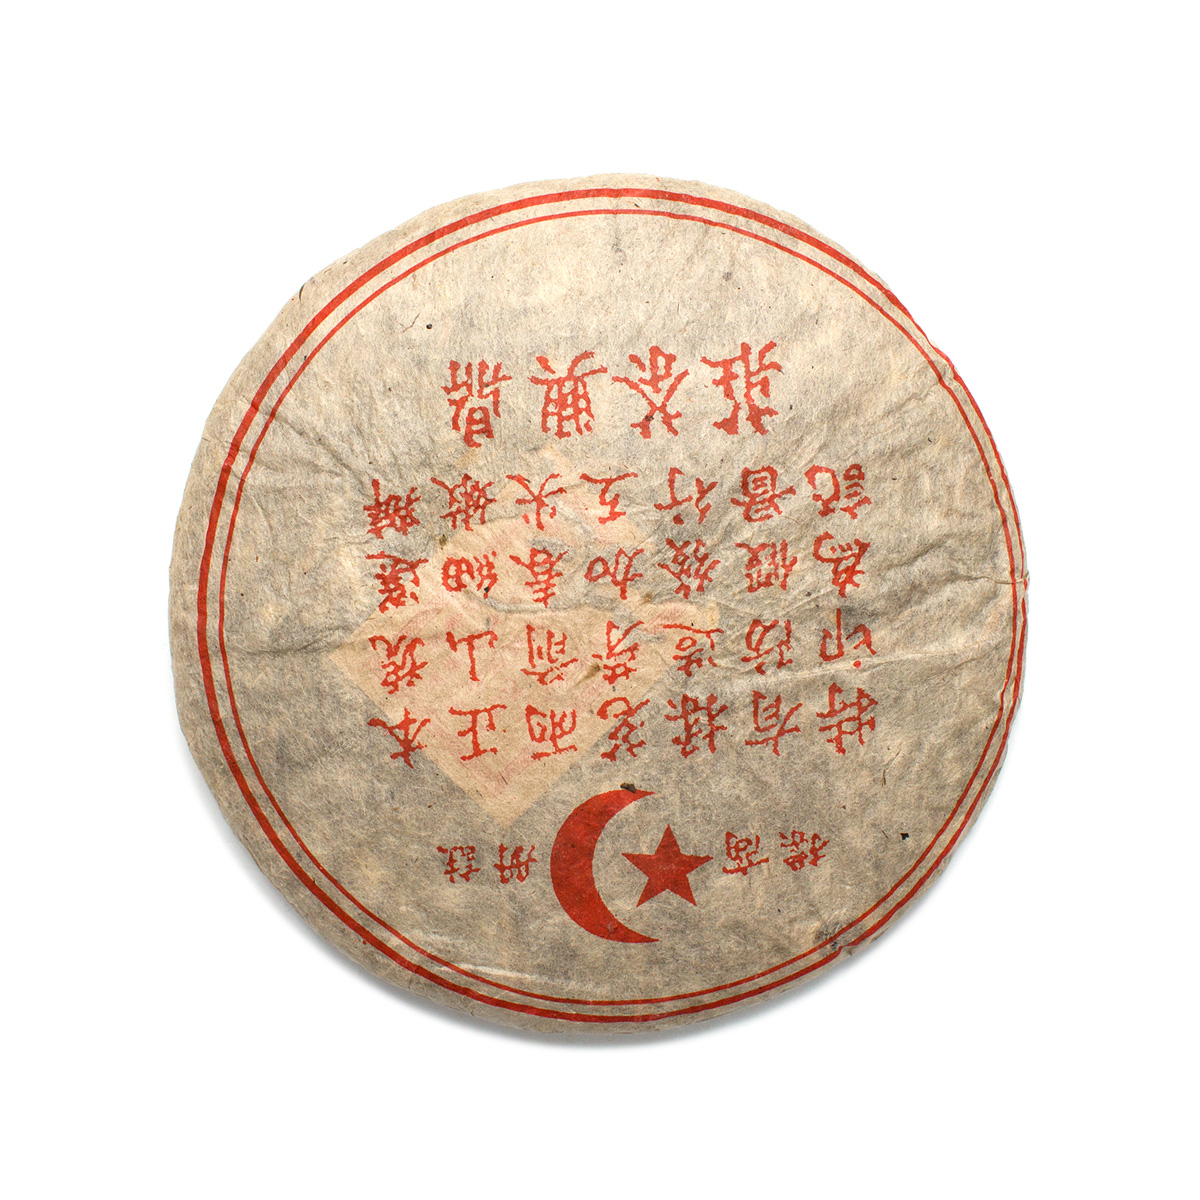 Хонг Динг Синг шен пуэр, 2009 г, блин 357 гр цены онлайн